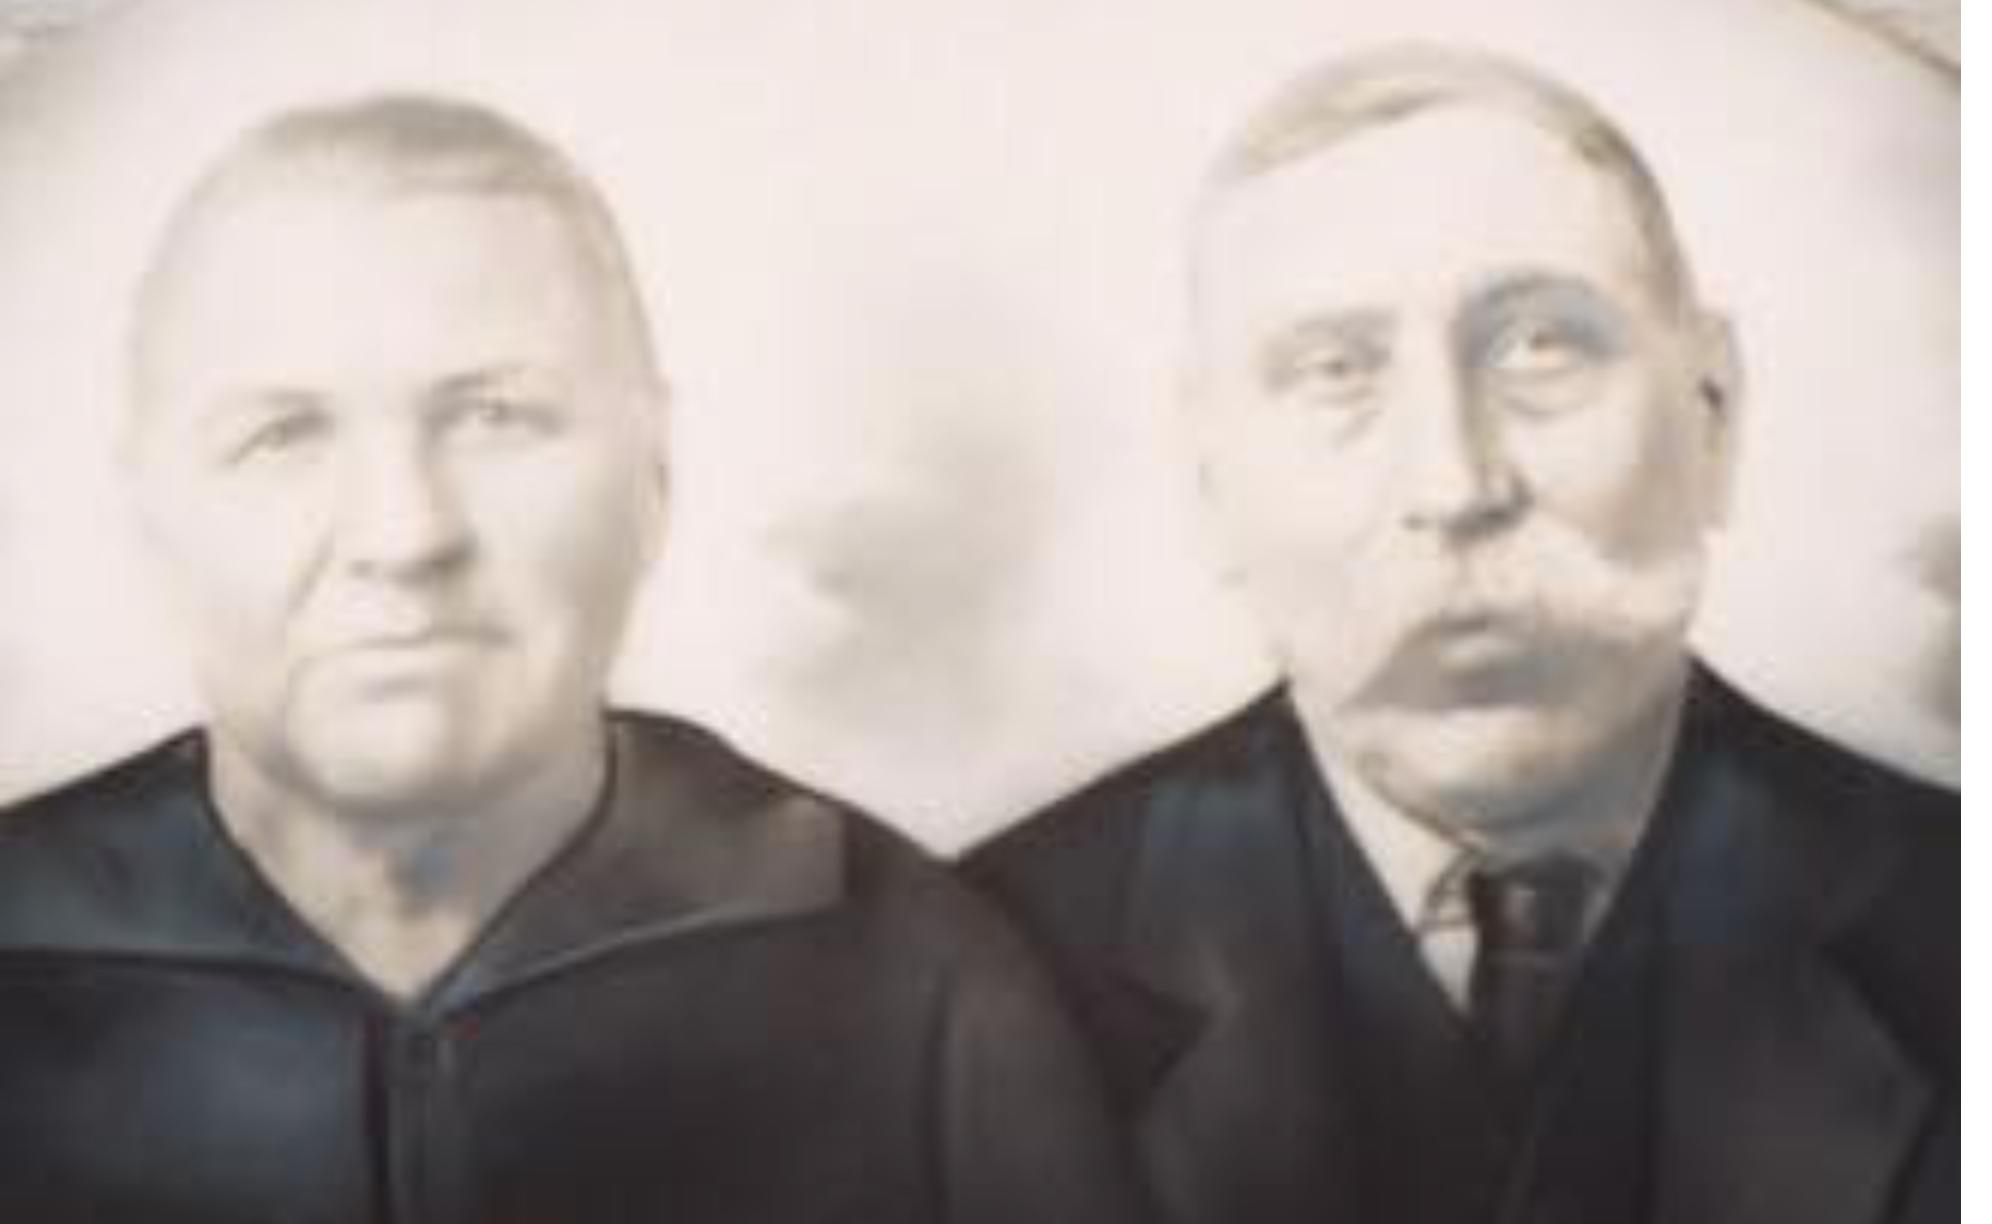 Agnes and Albert Grzeskowiak